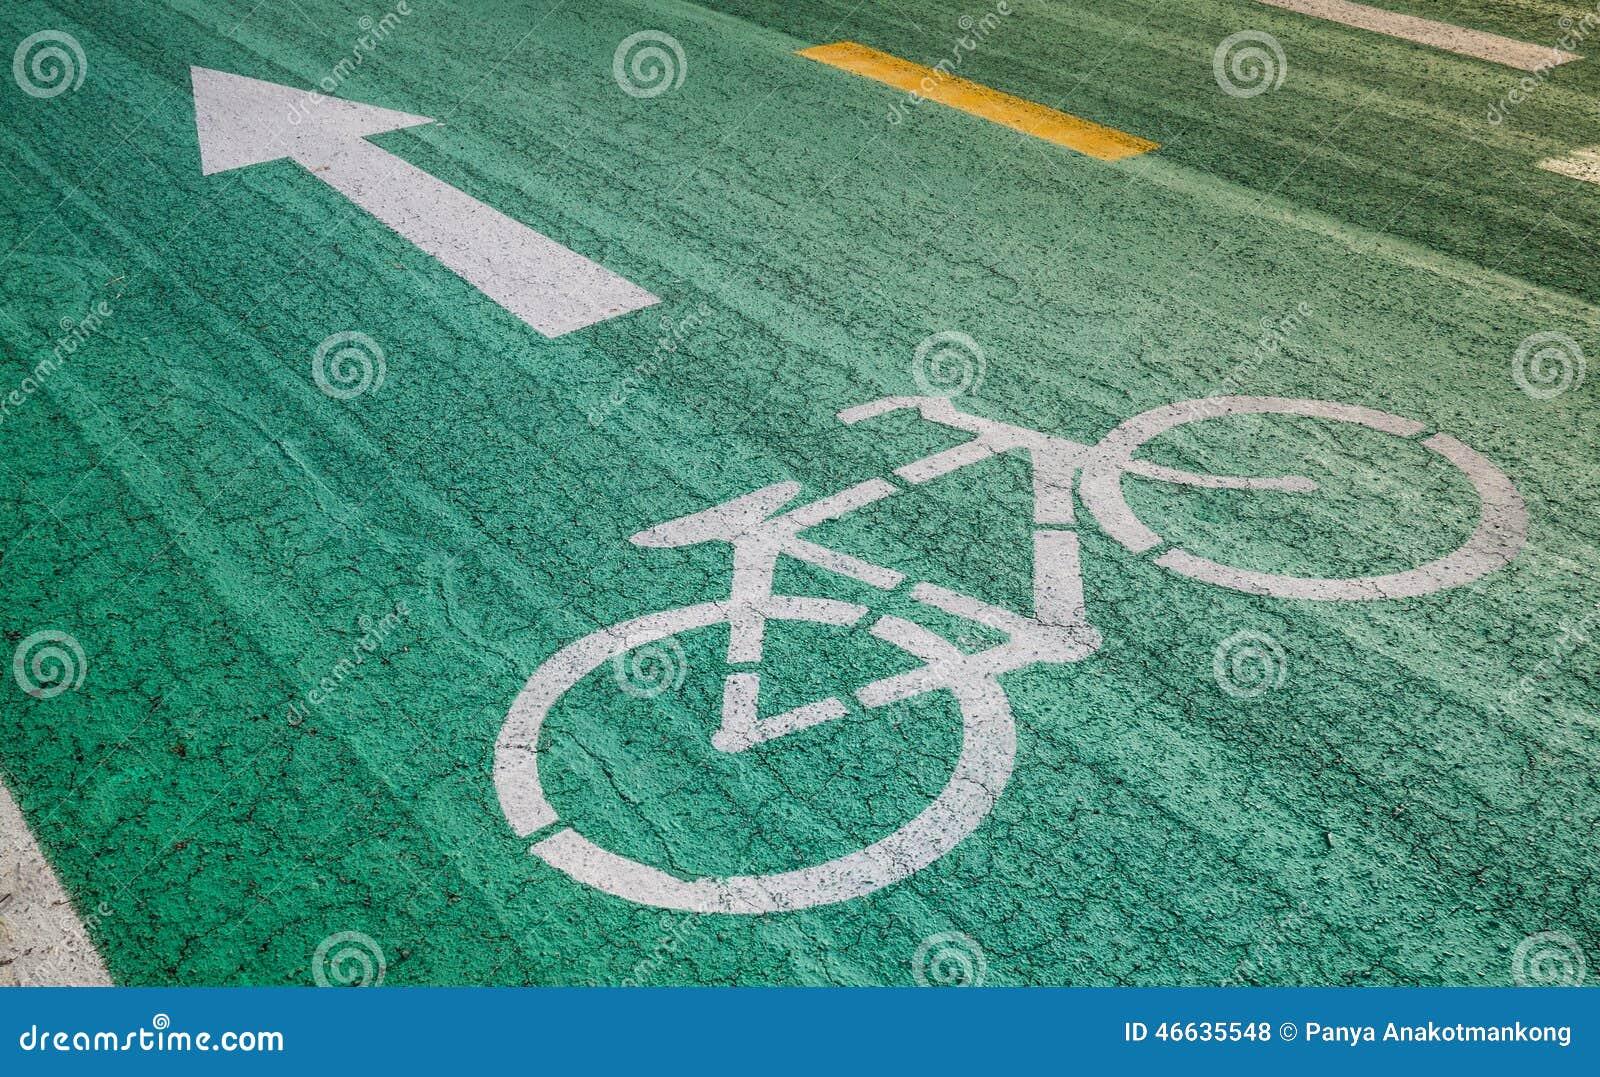 Old Bike Track Stock Photo Image 46635548